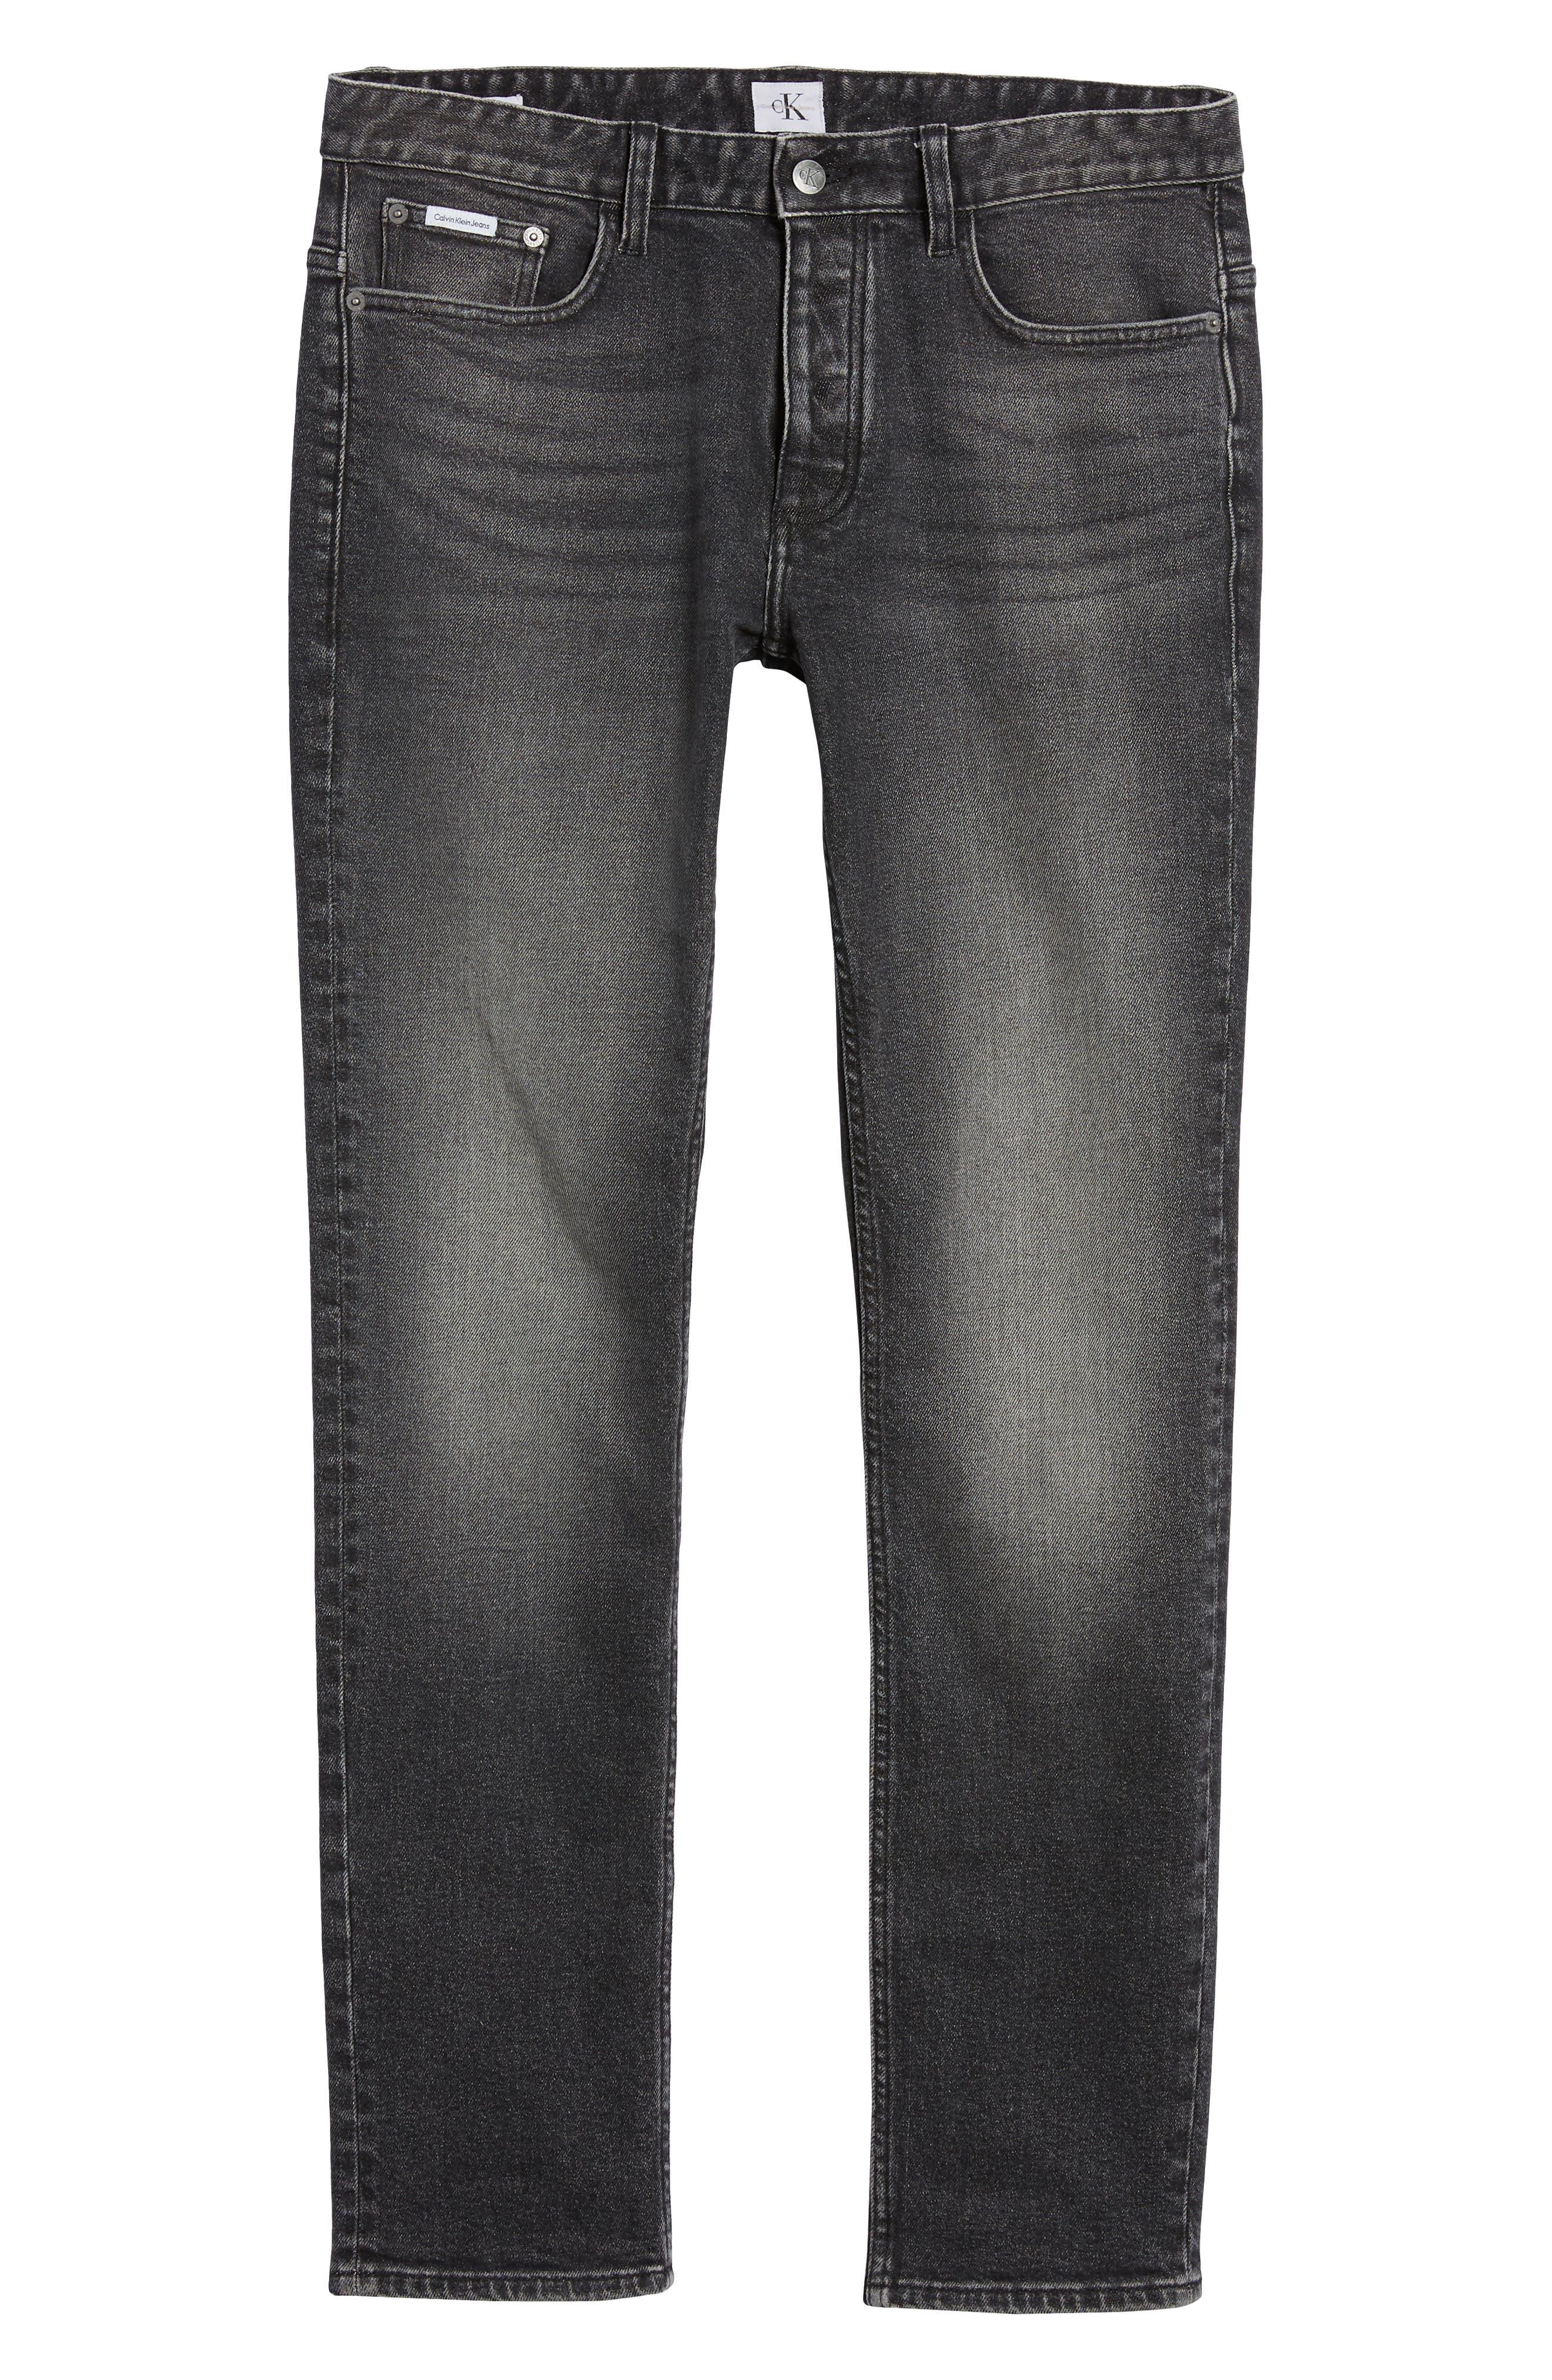 Skinny Jeans,                             Alternate thumbnail 6, color,                             001